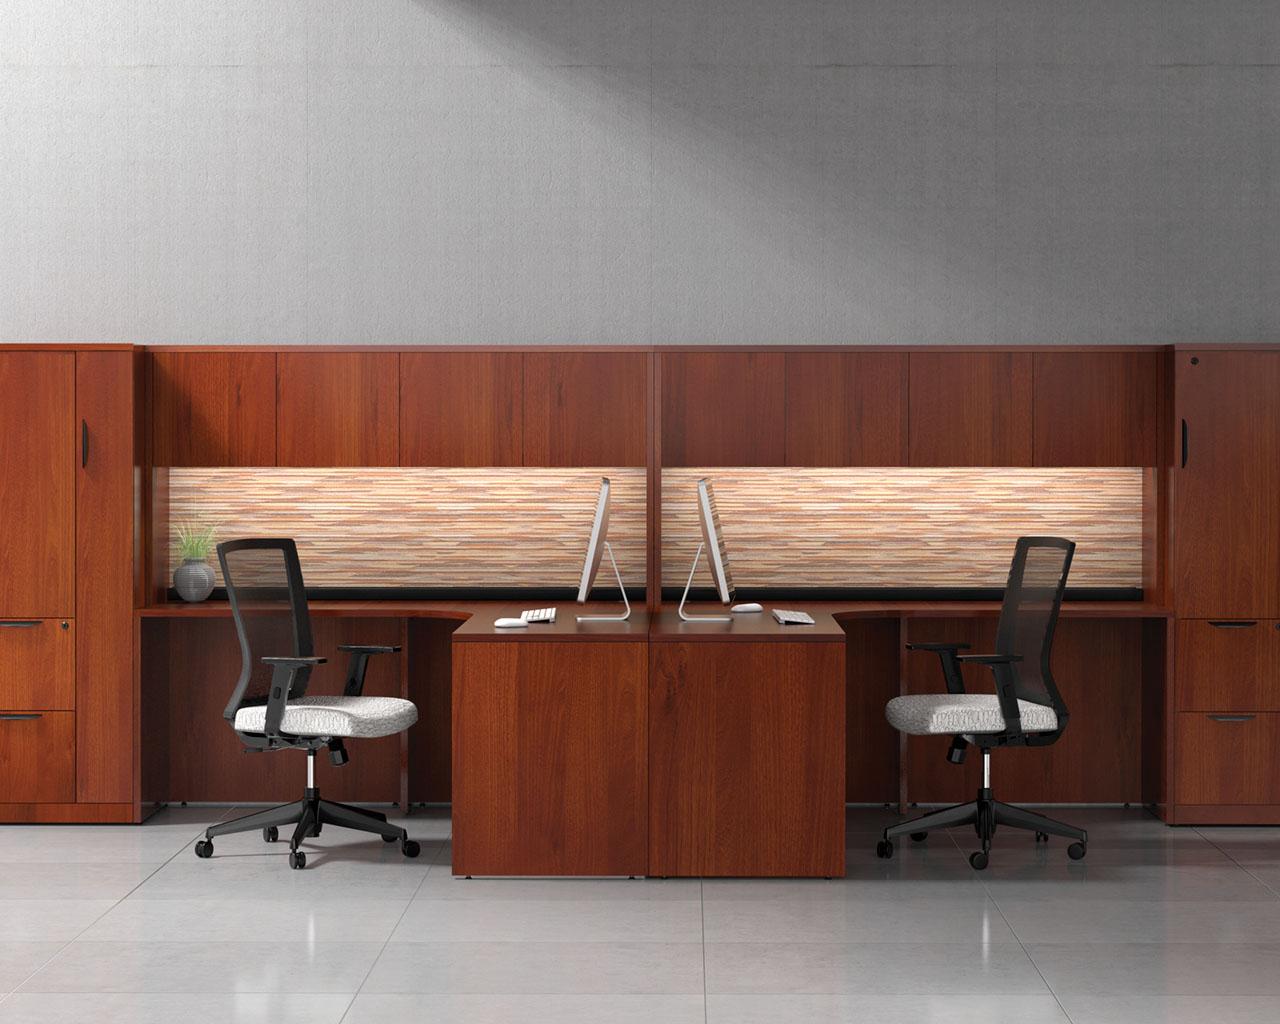 L-Shaped Corner desk with Optional Hutch (2 shown)